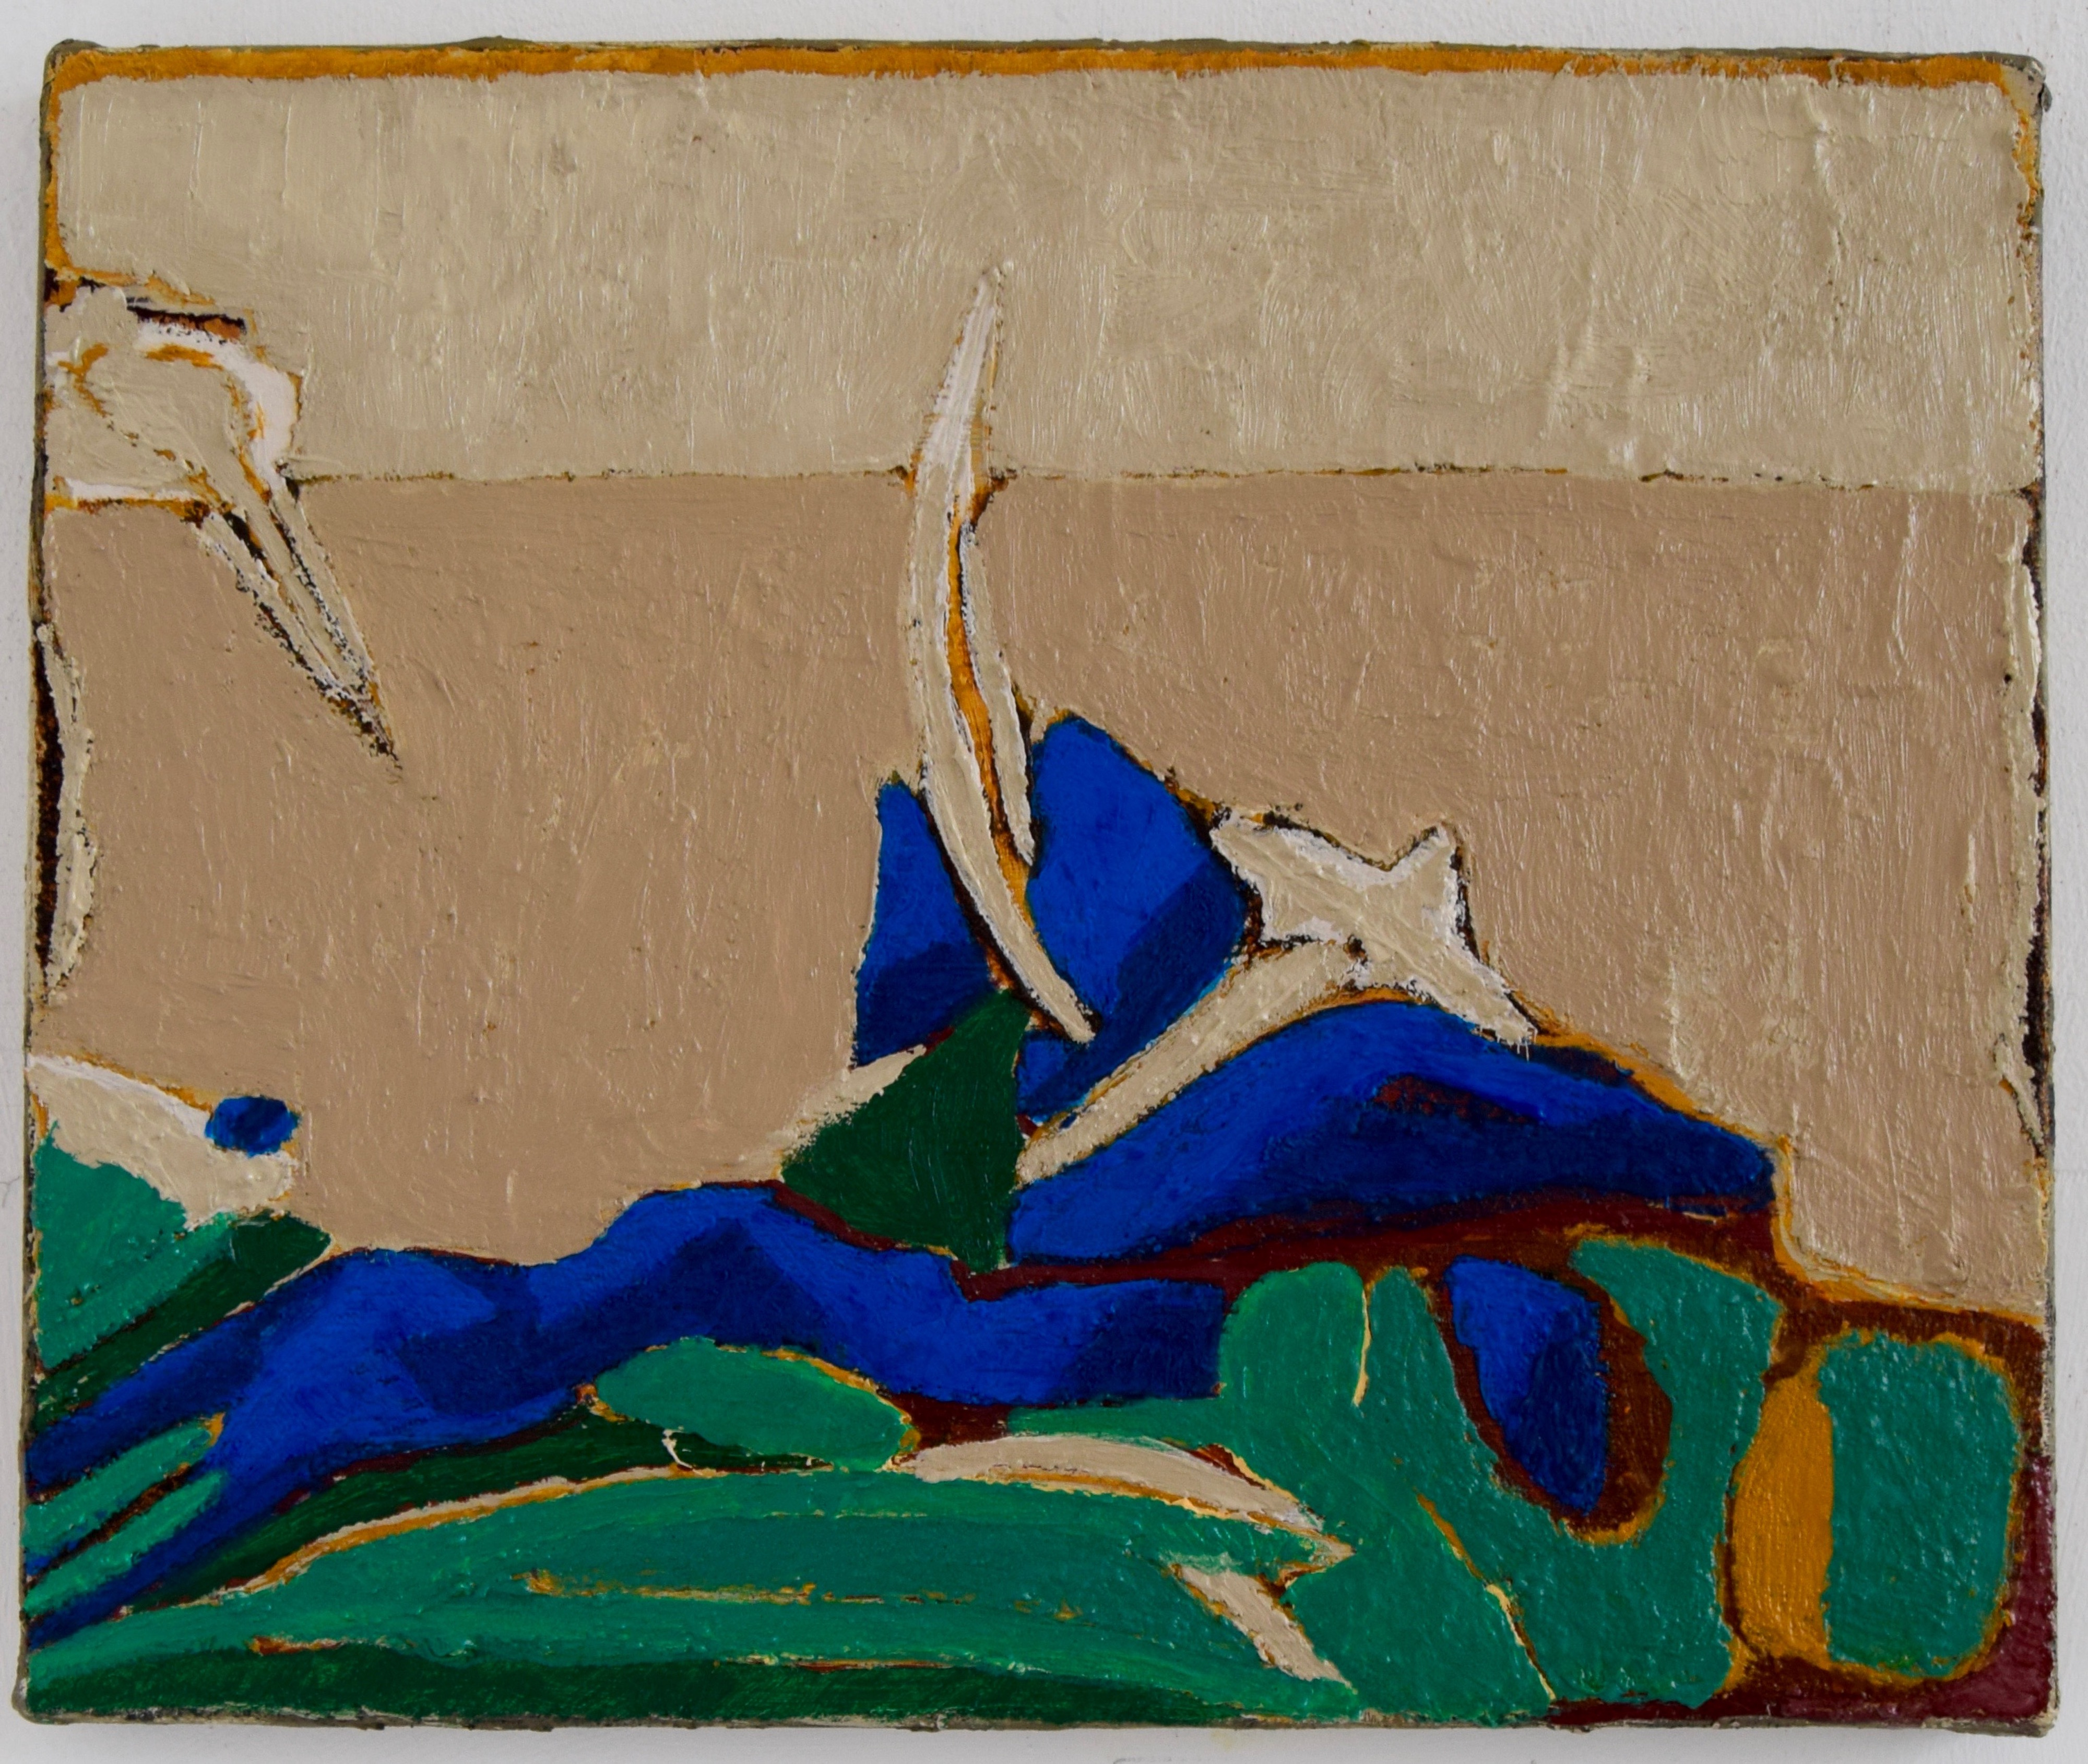 Feature of landscape1, oil on canvas, 25x35cm, 2017